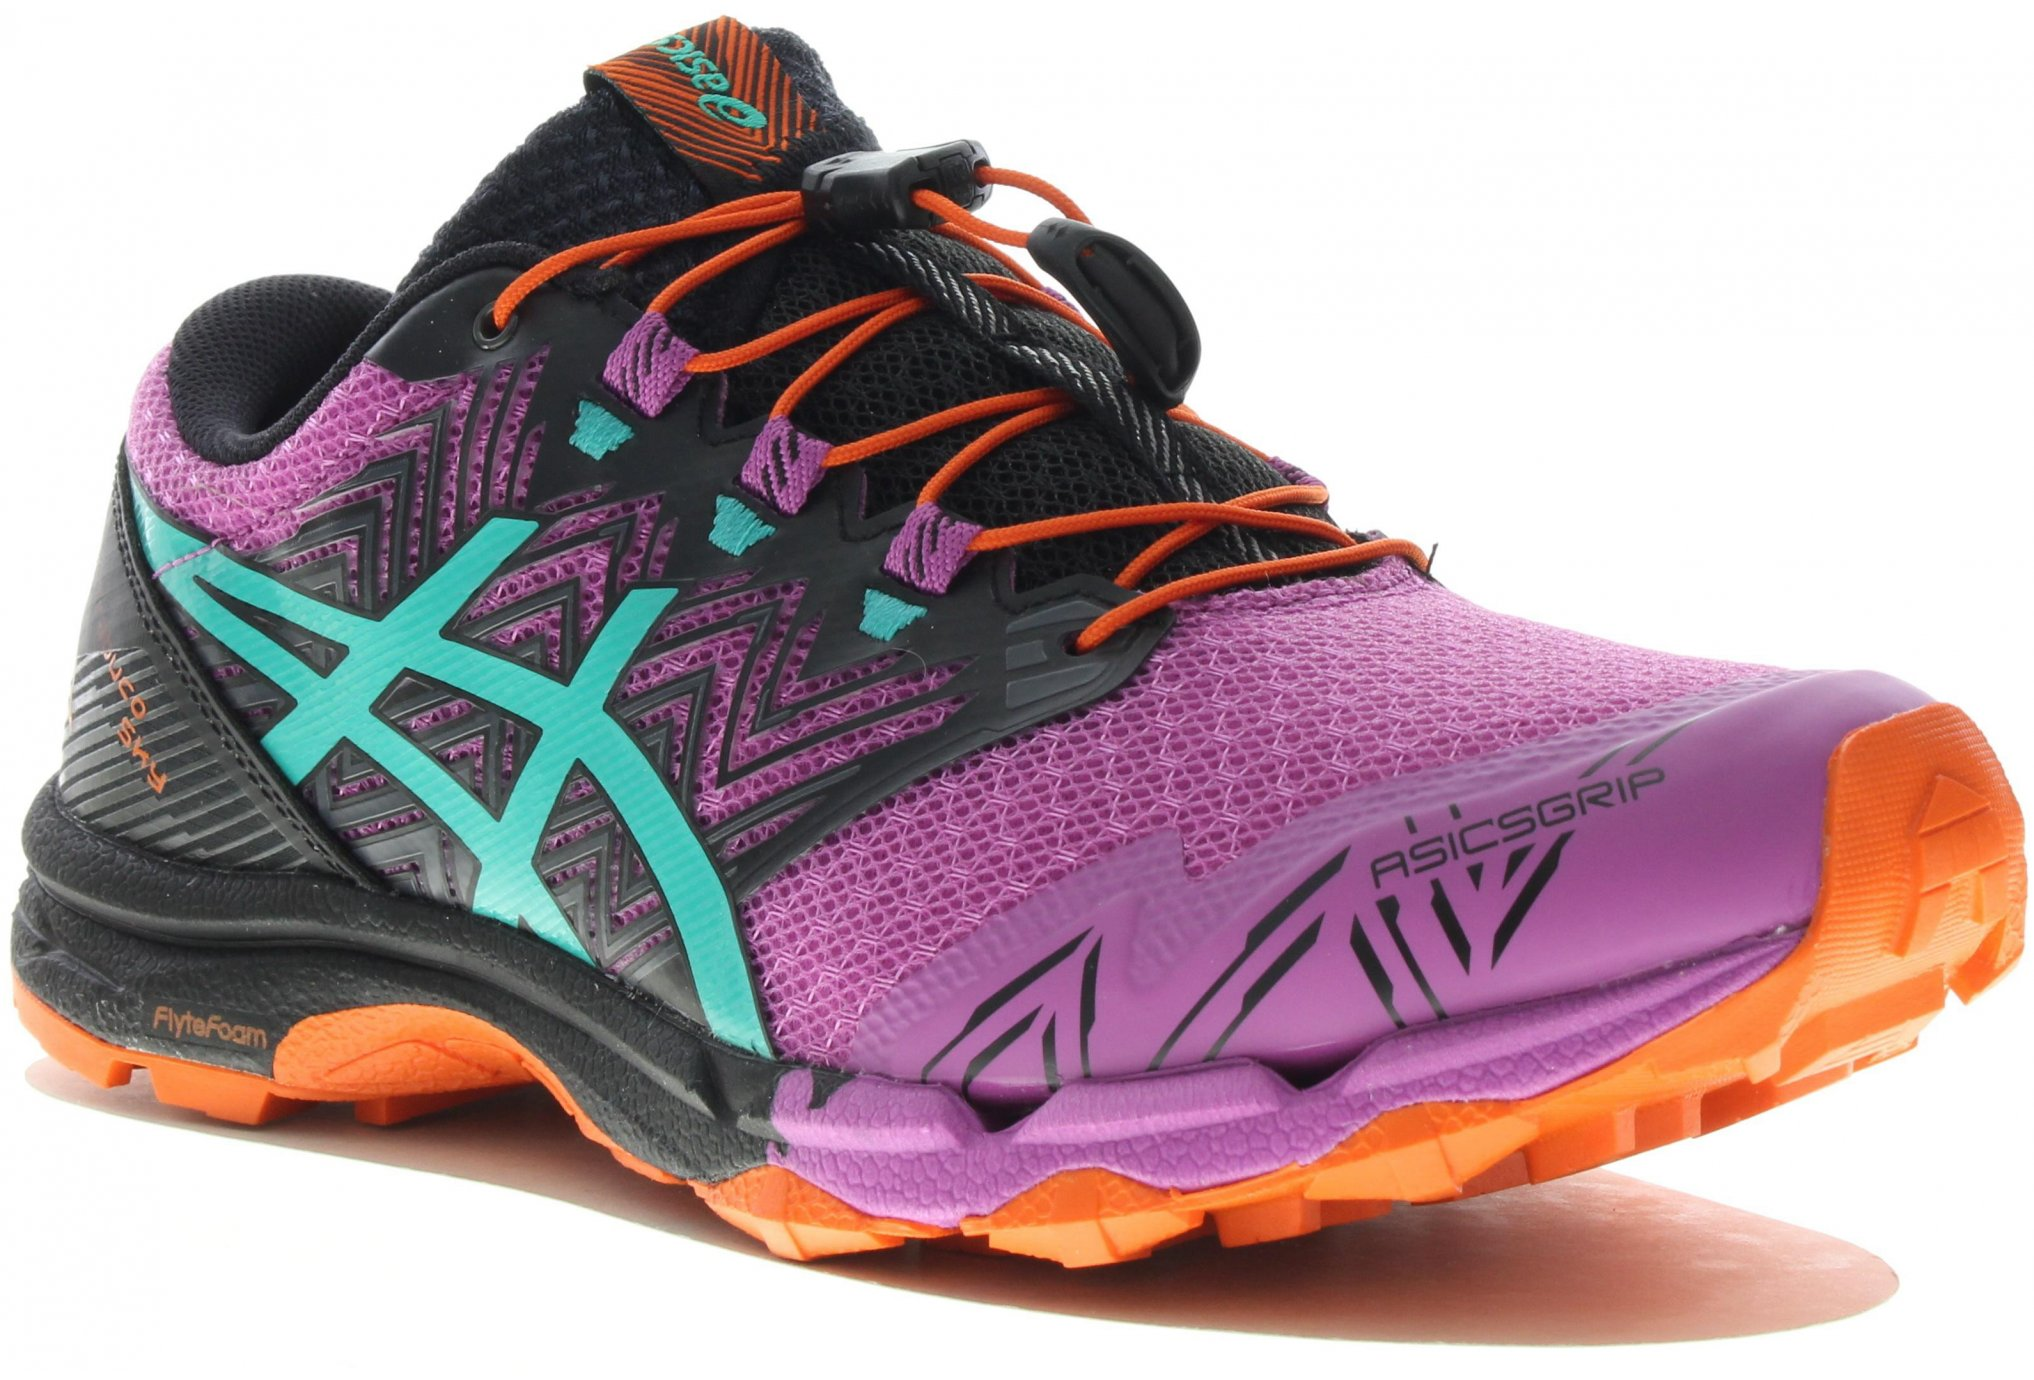 Asics Gel-FujiTrabuco SKY Chaussures running femme